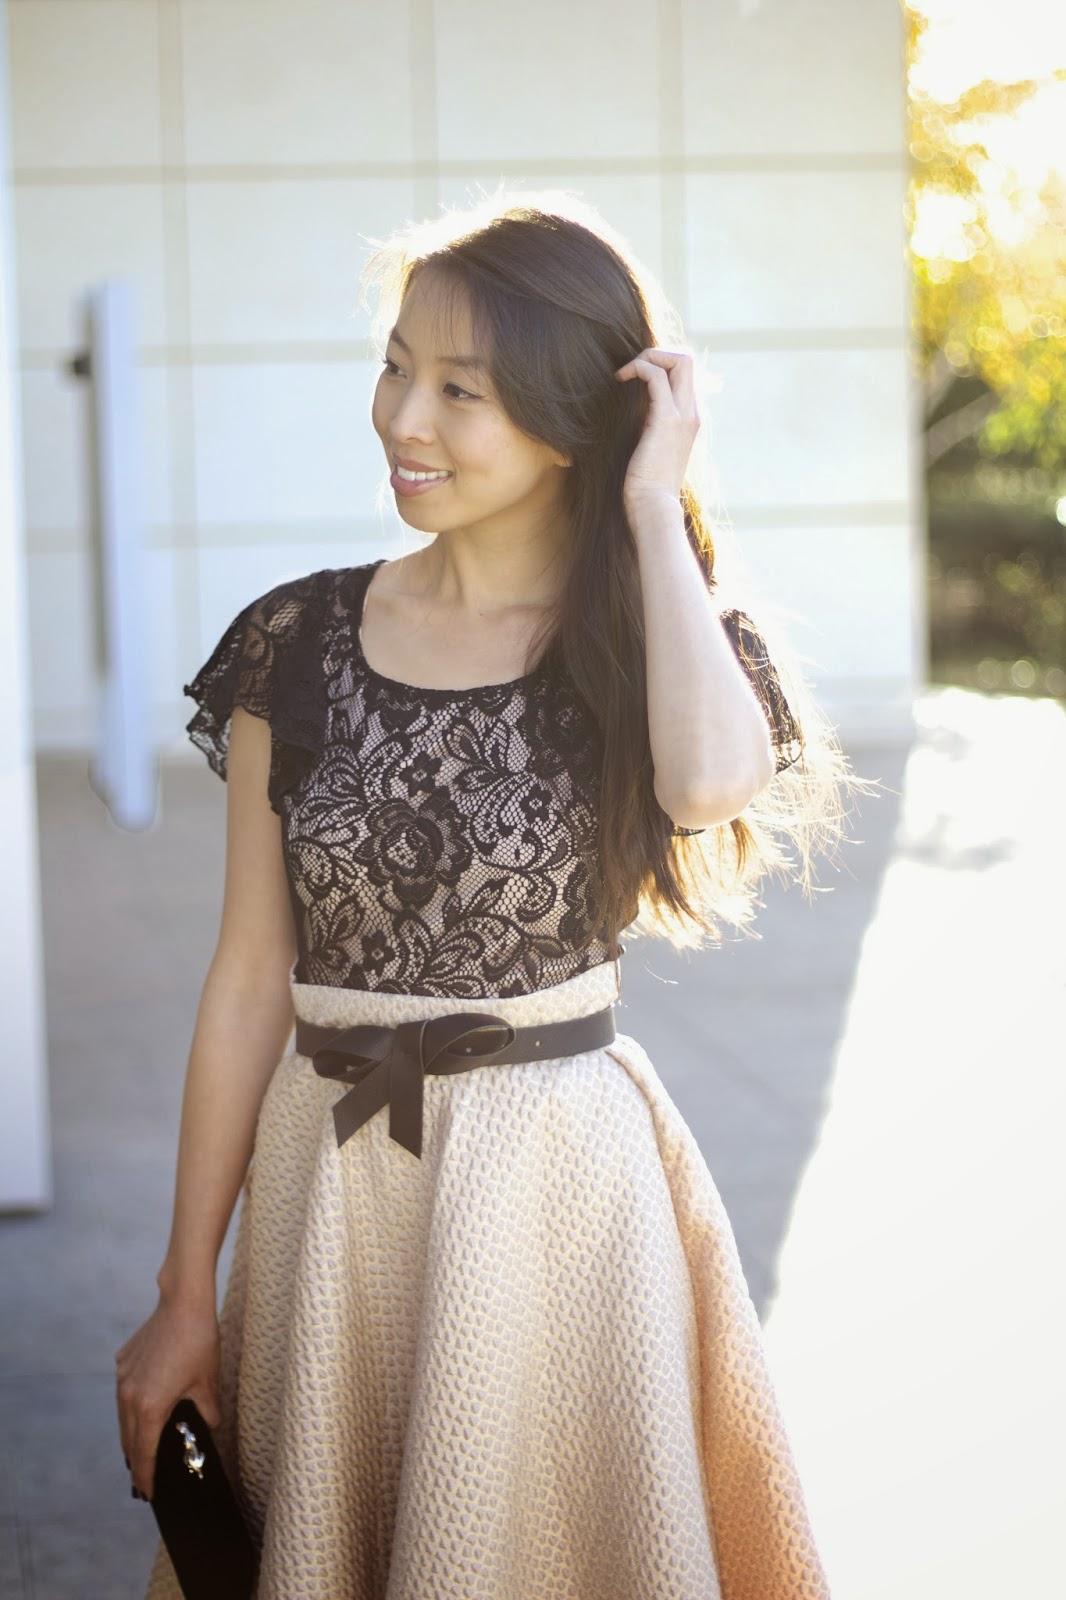 586113b791 Connnietang: Lulu's Holiday Look: Gold Midi & Lace